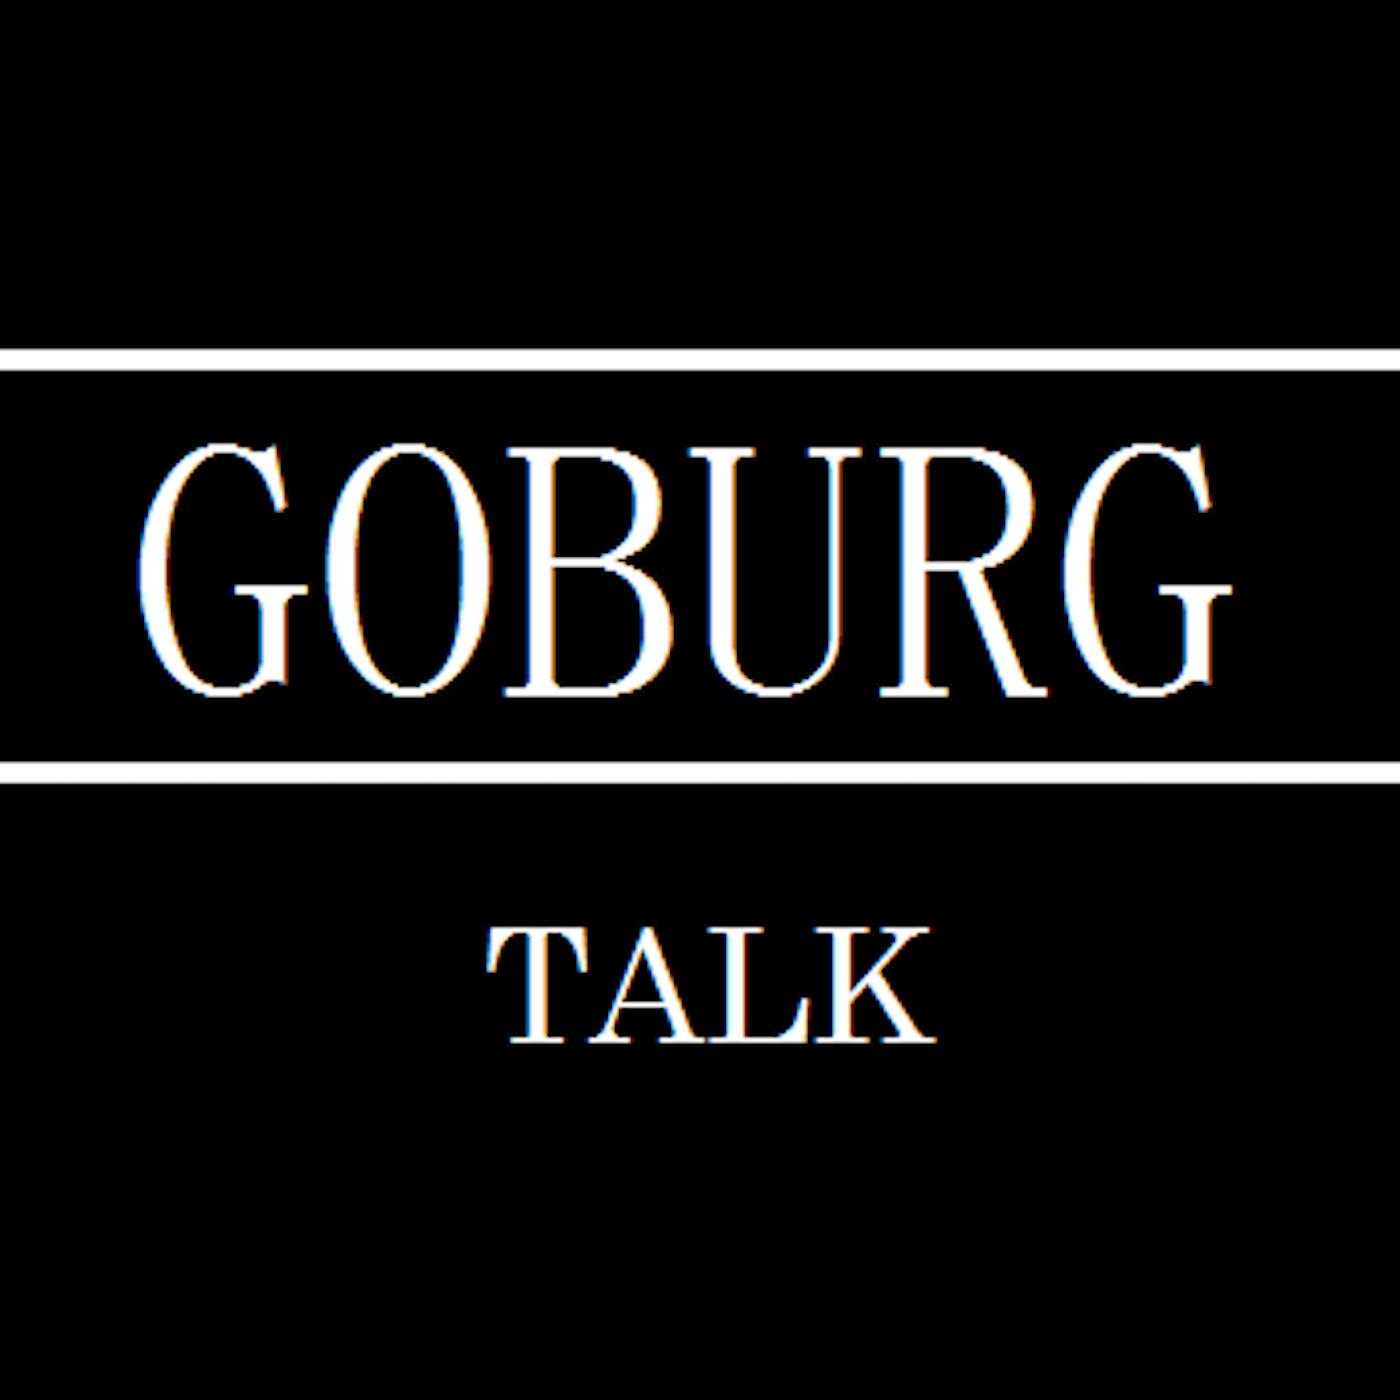 Goburg Talk show art